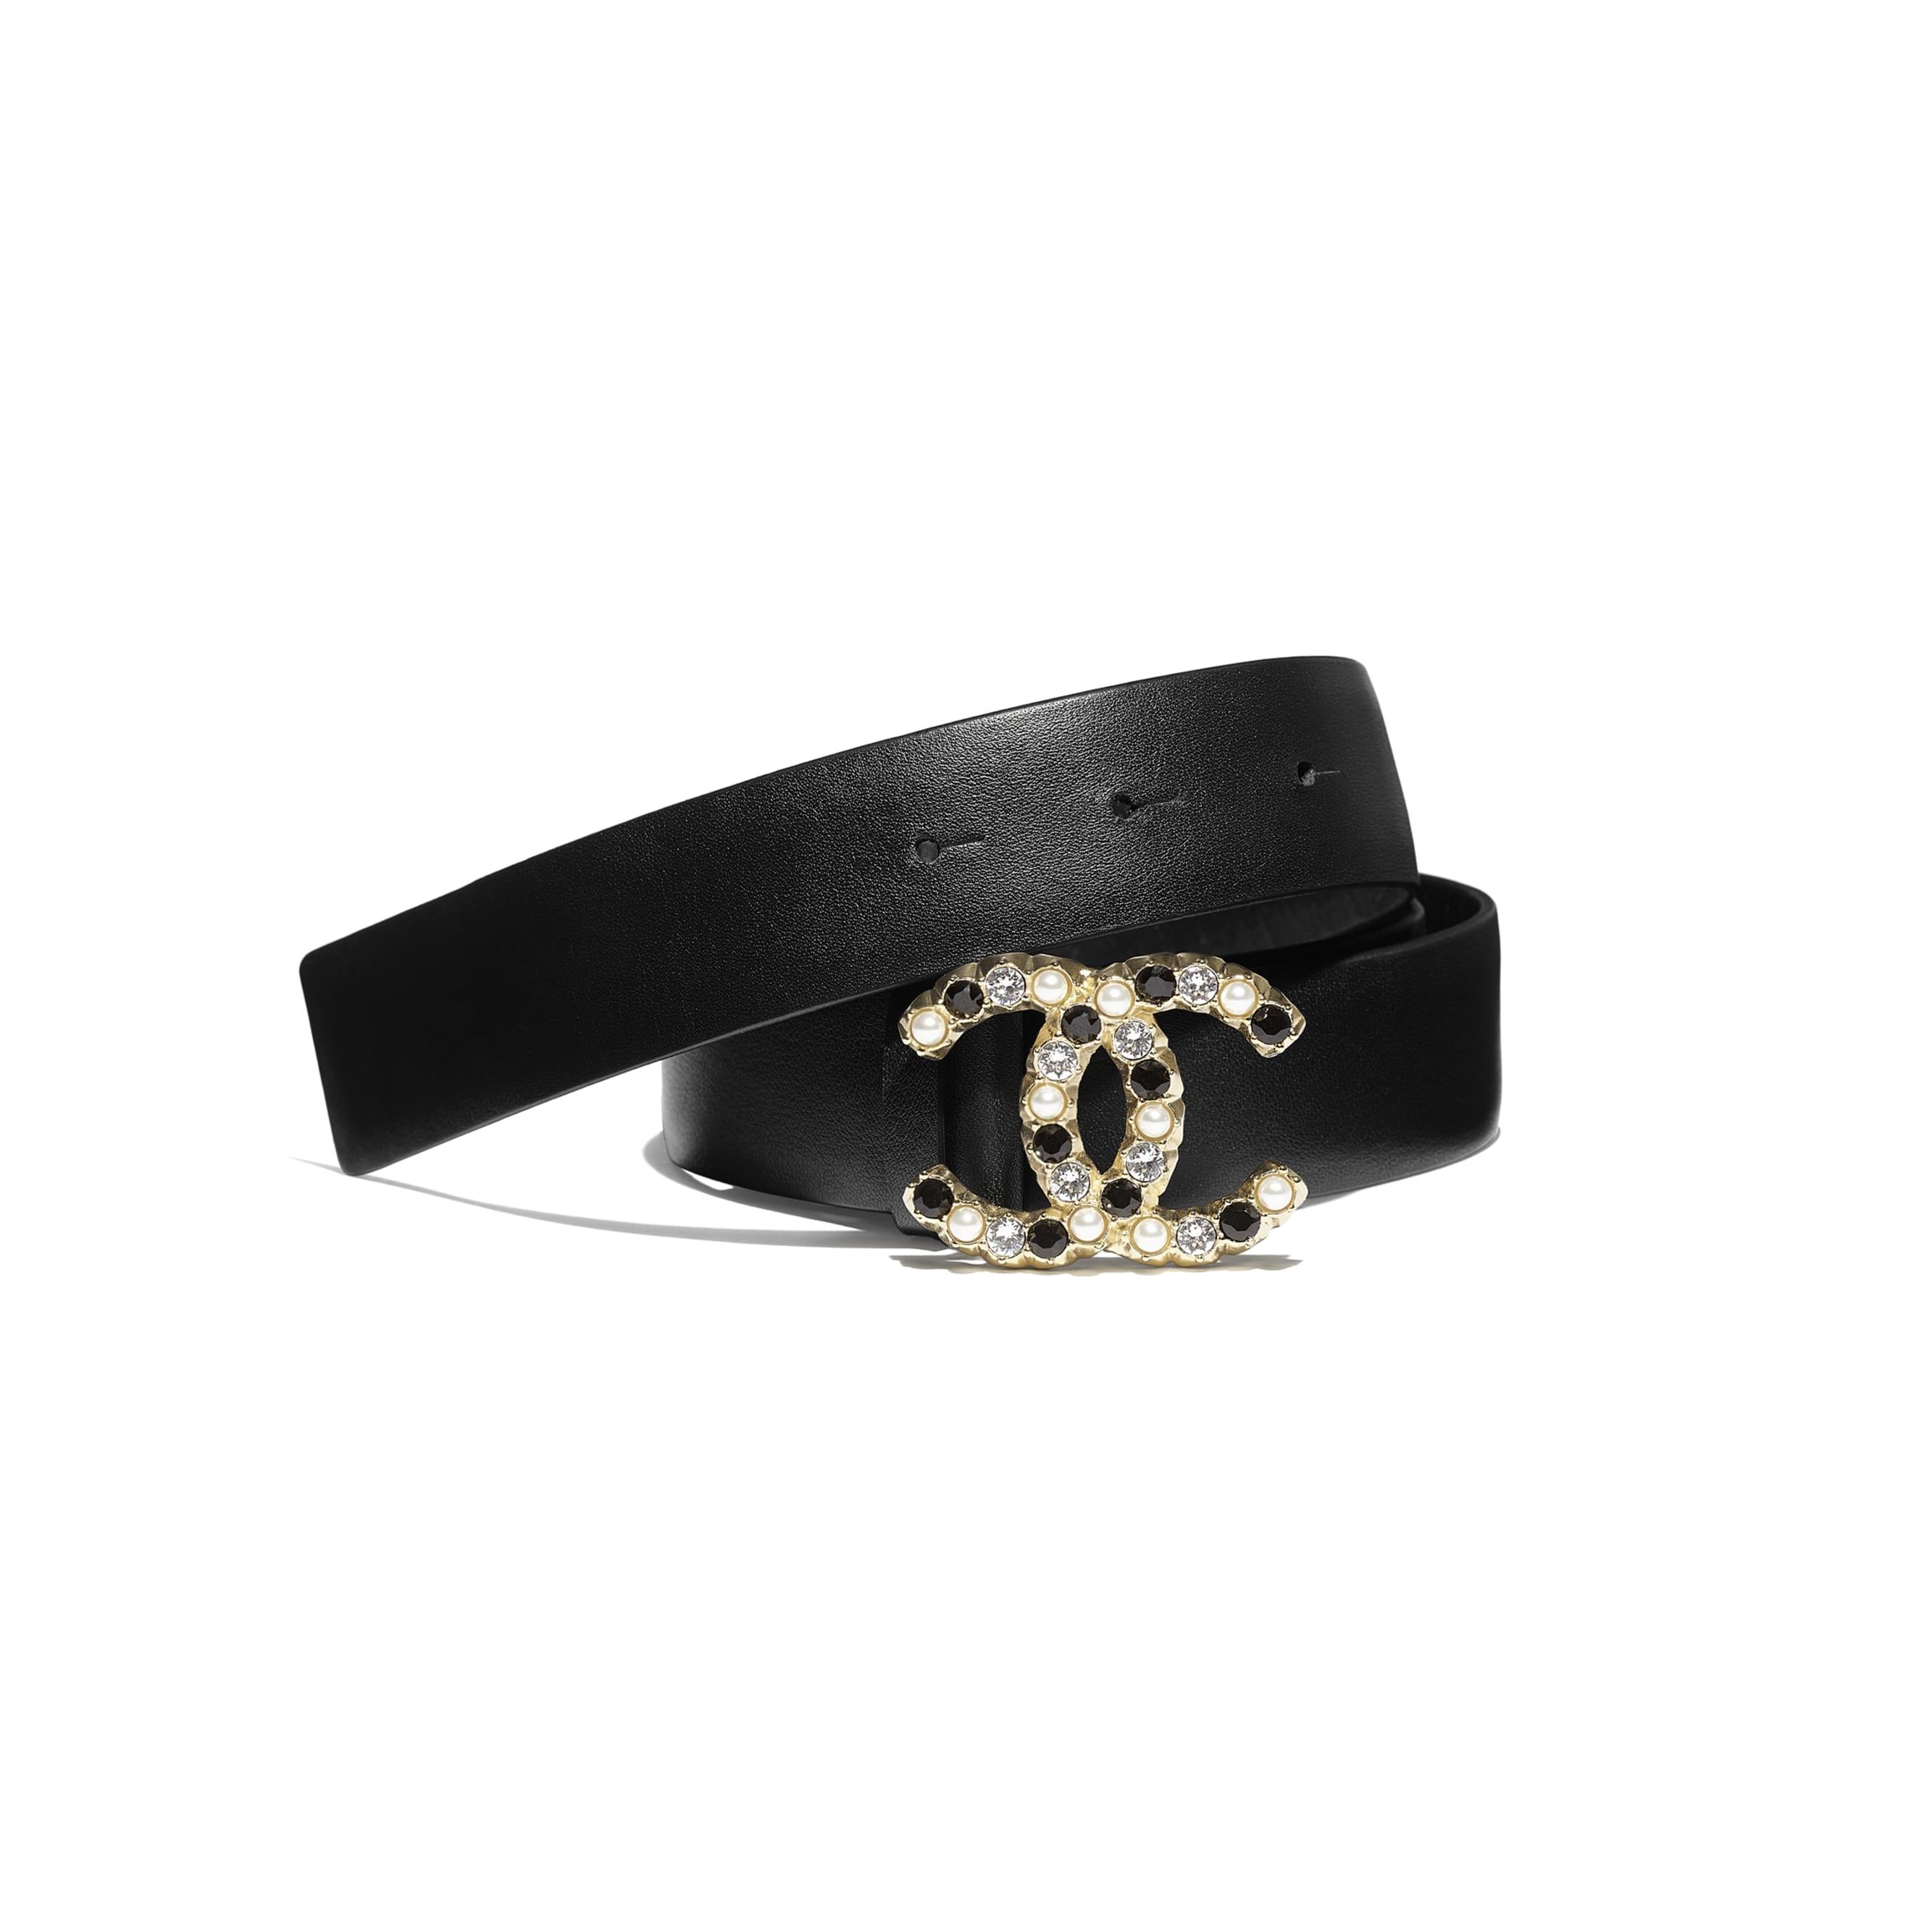 Belt - Black - Calfskin, Gold-Tone Metal, Glass Pearls & Strass - CHANEL - Default view - see standard sized version